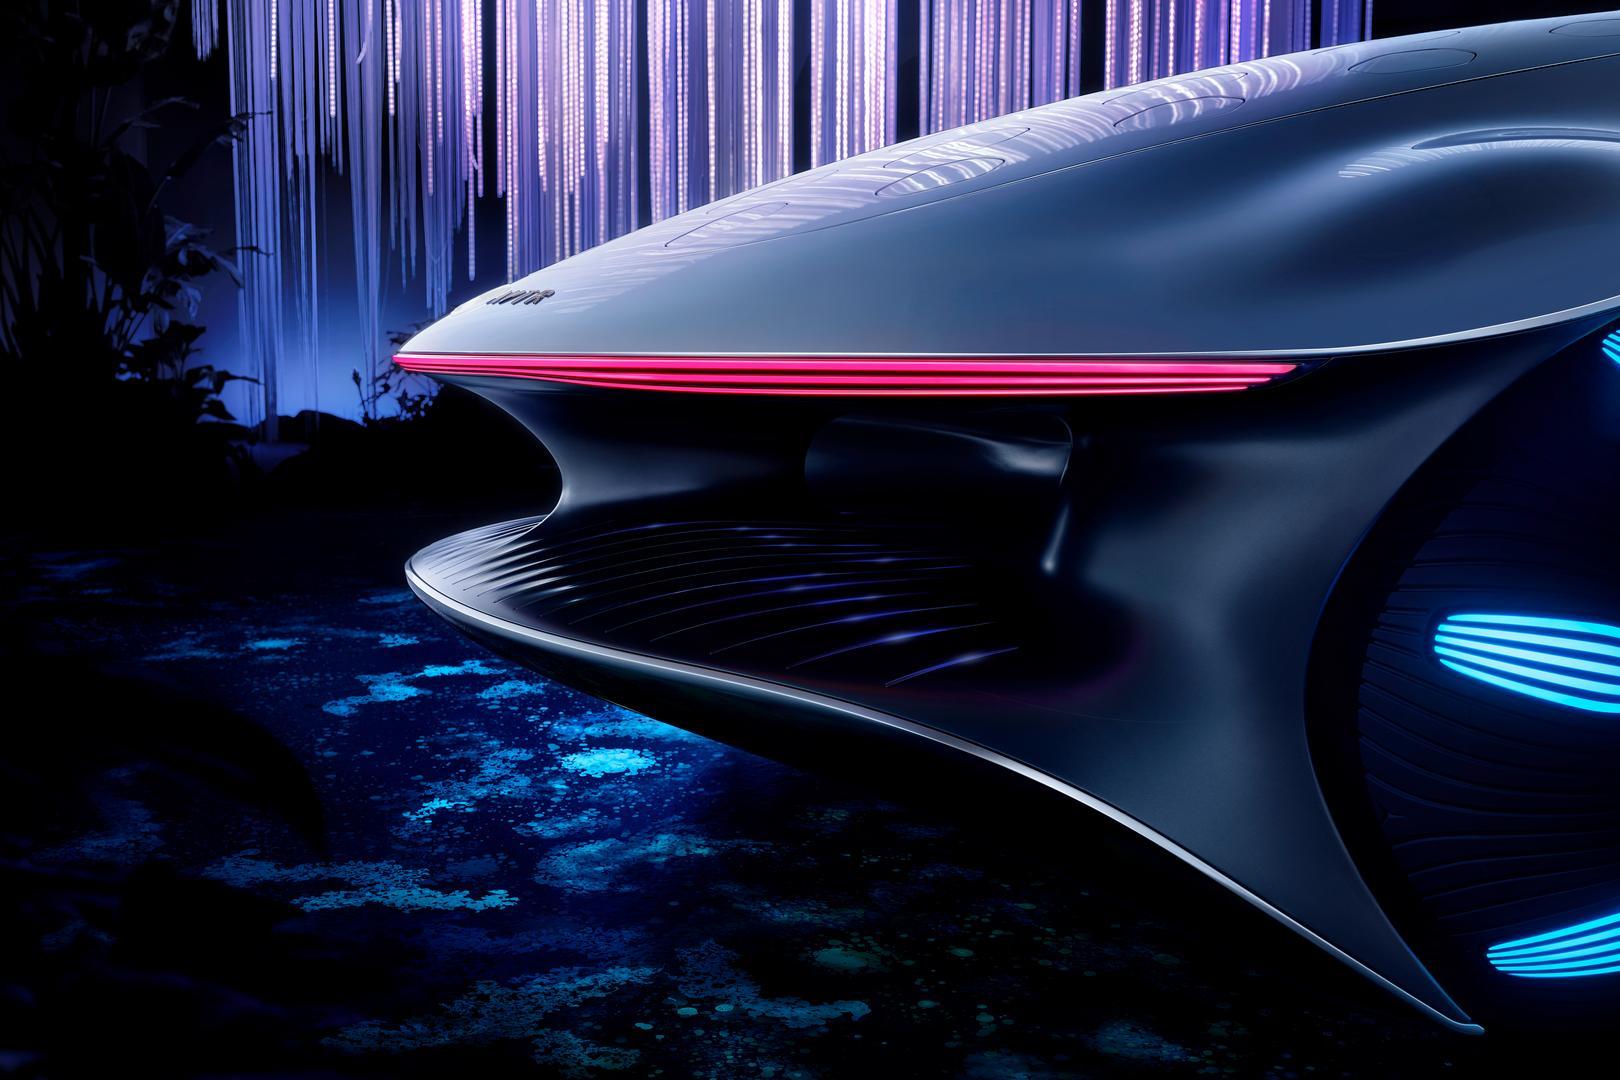 Mercedes-Benz VISION AVTR Rear Lights